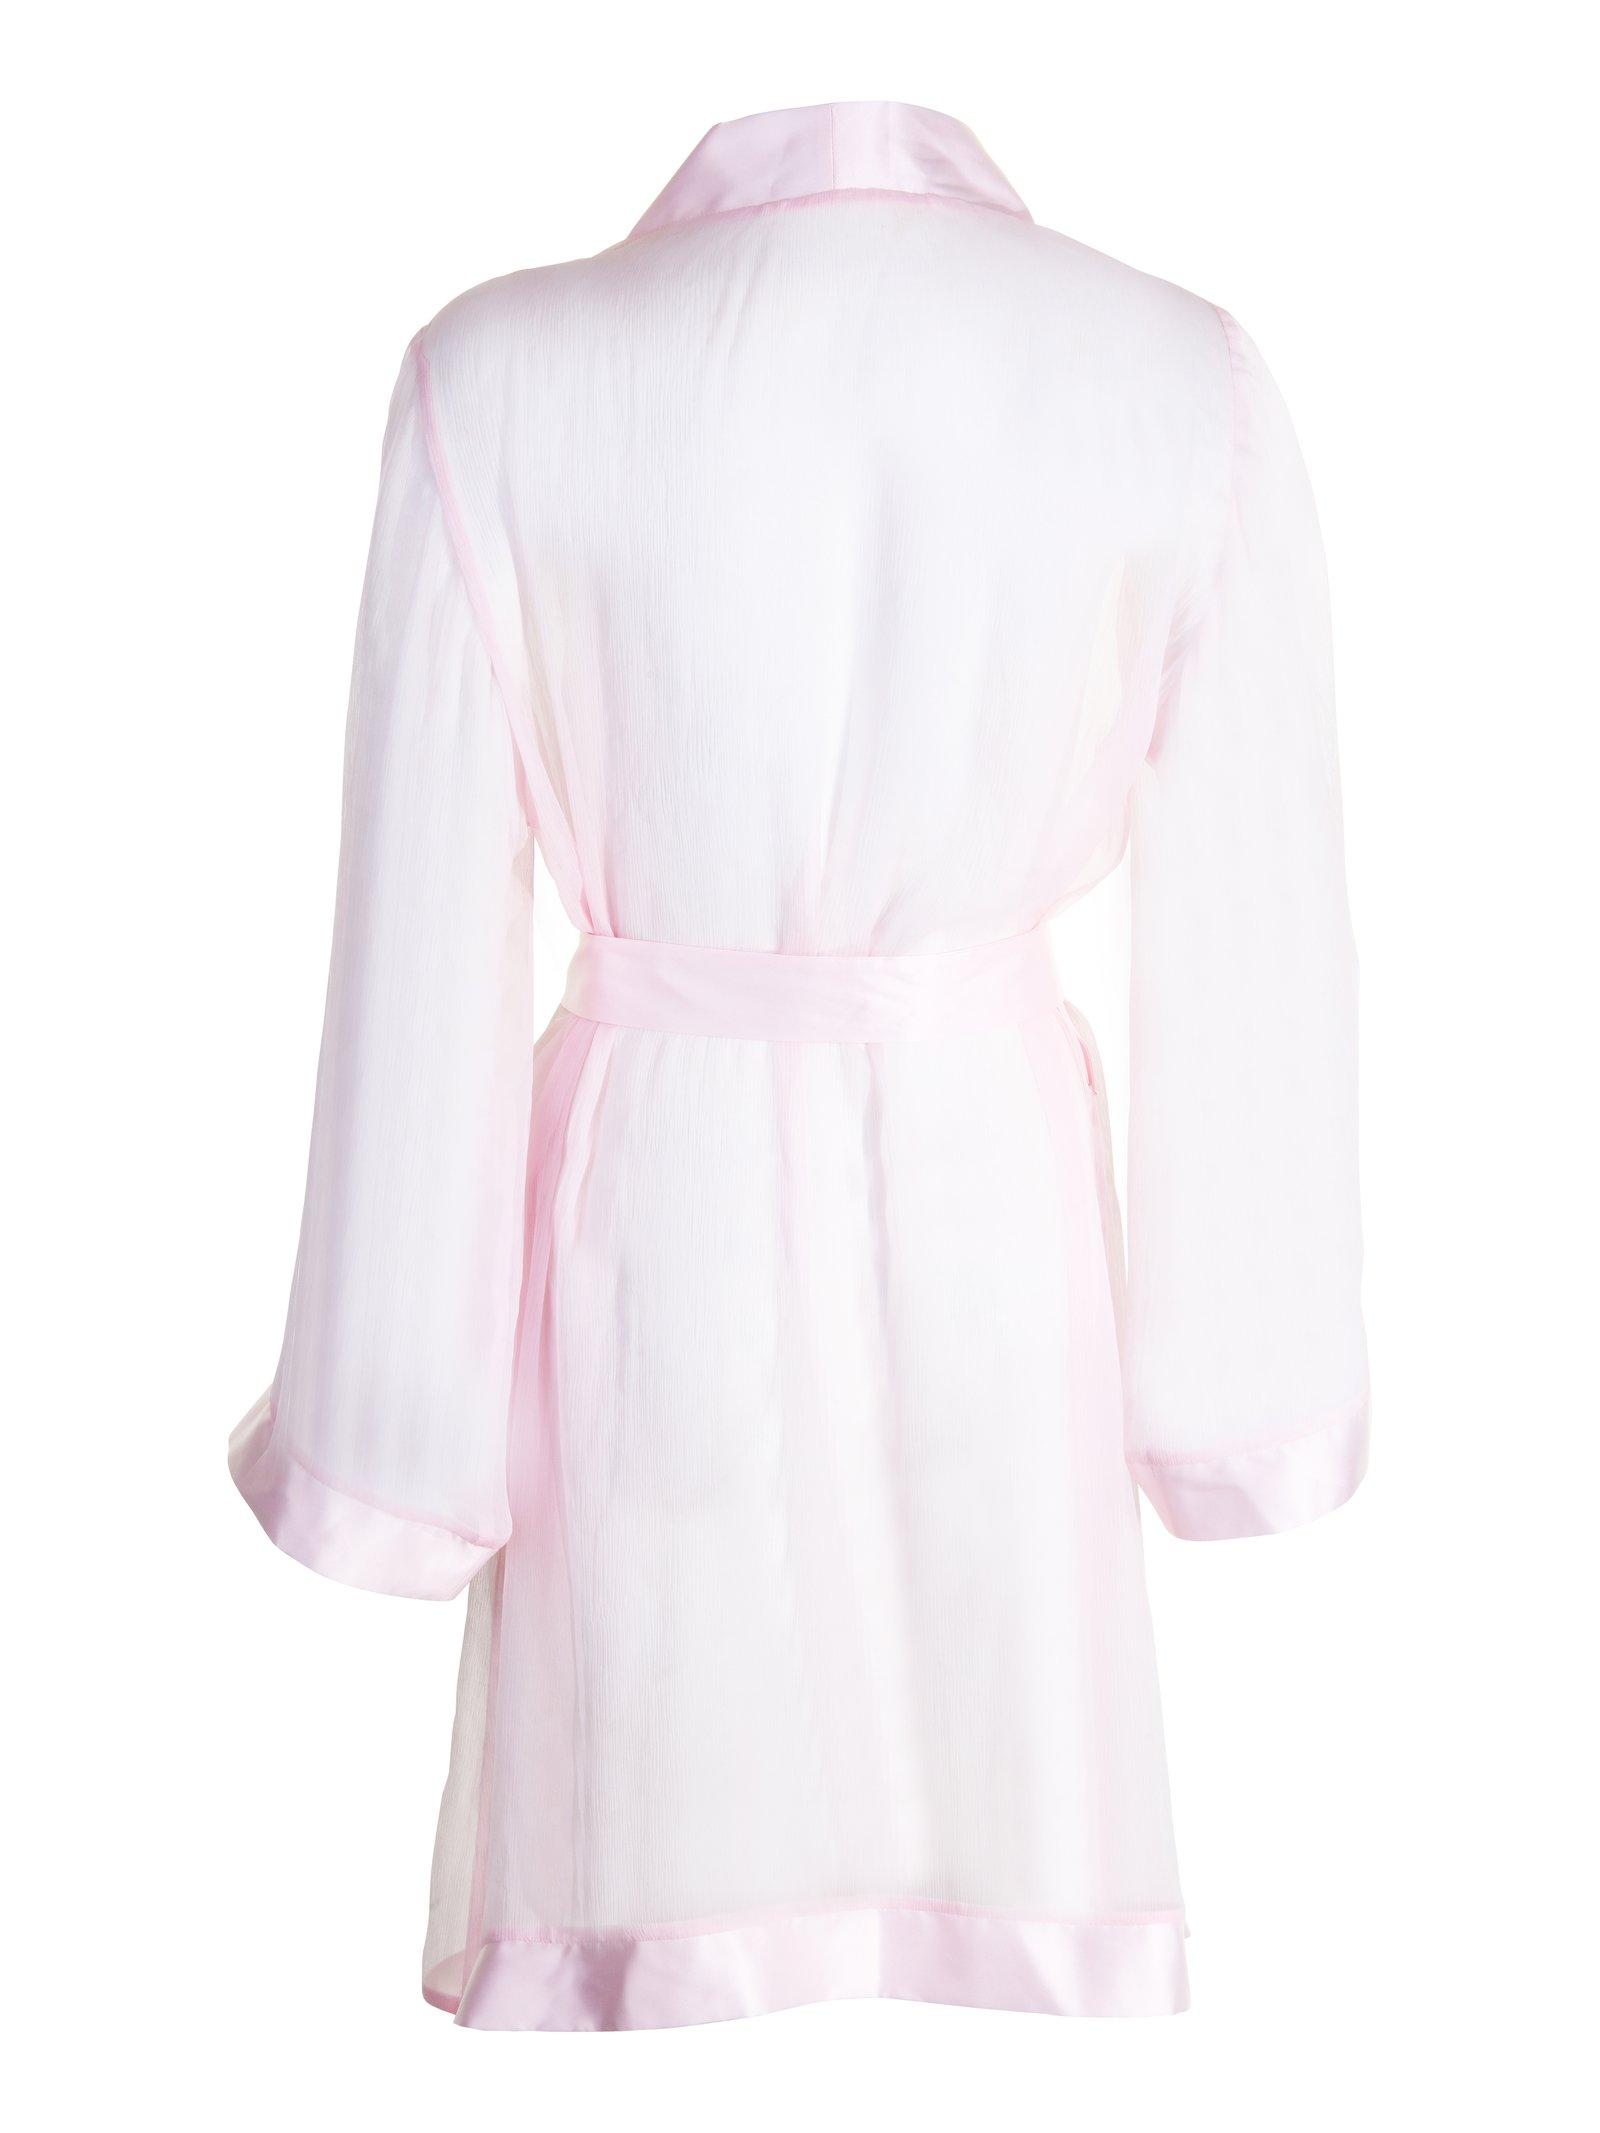 NightProwl Faith Robe